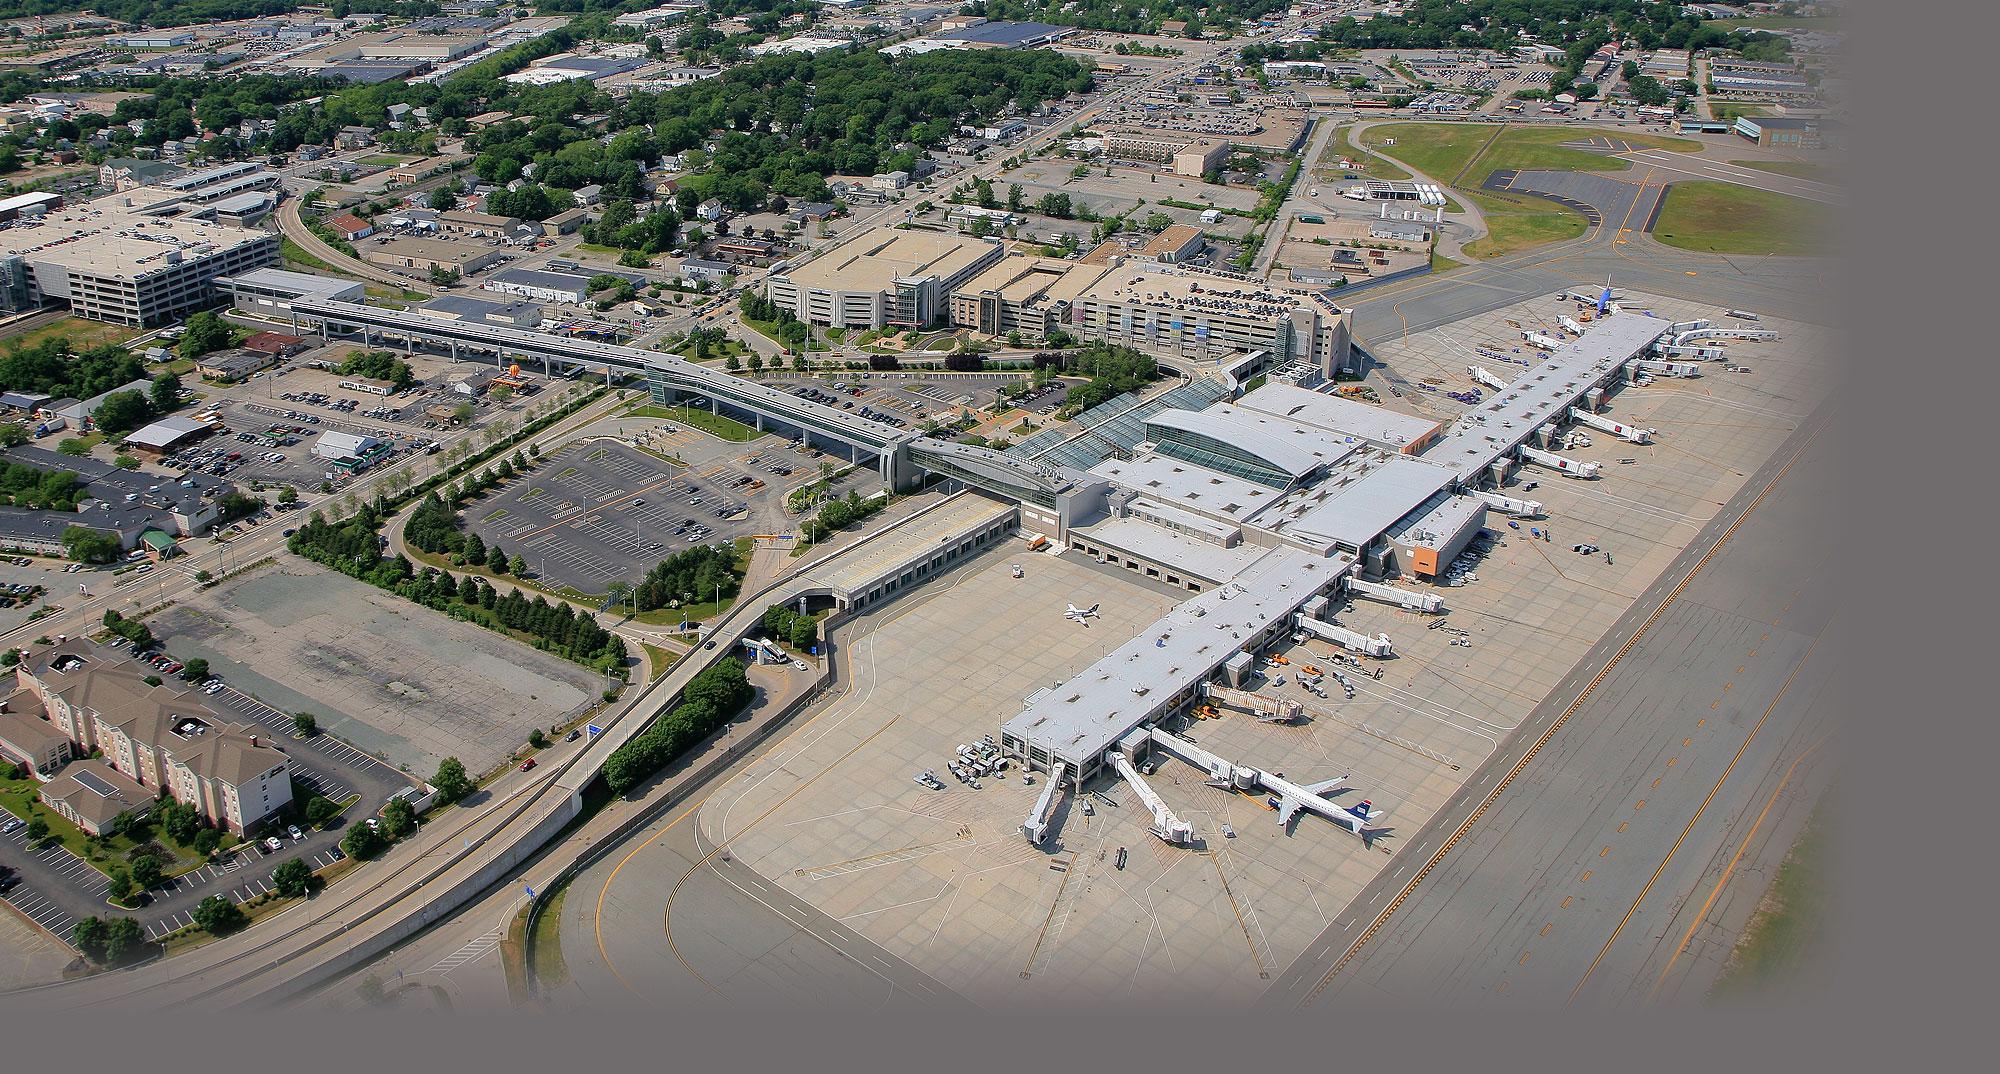 tfgreen-airport-simply-more-enjoyable.jpg